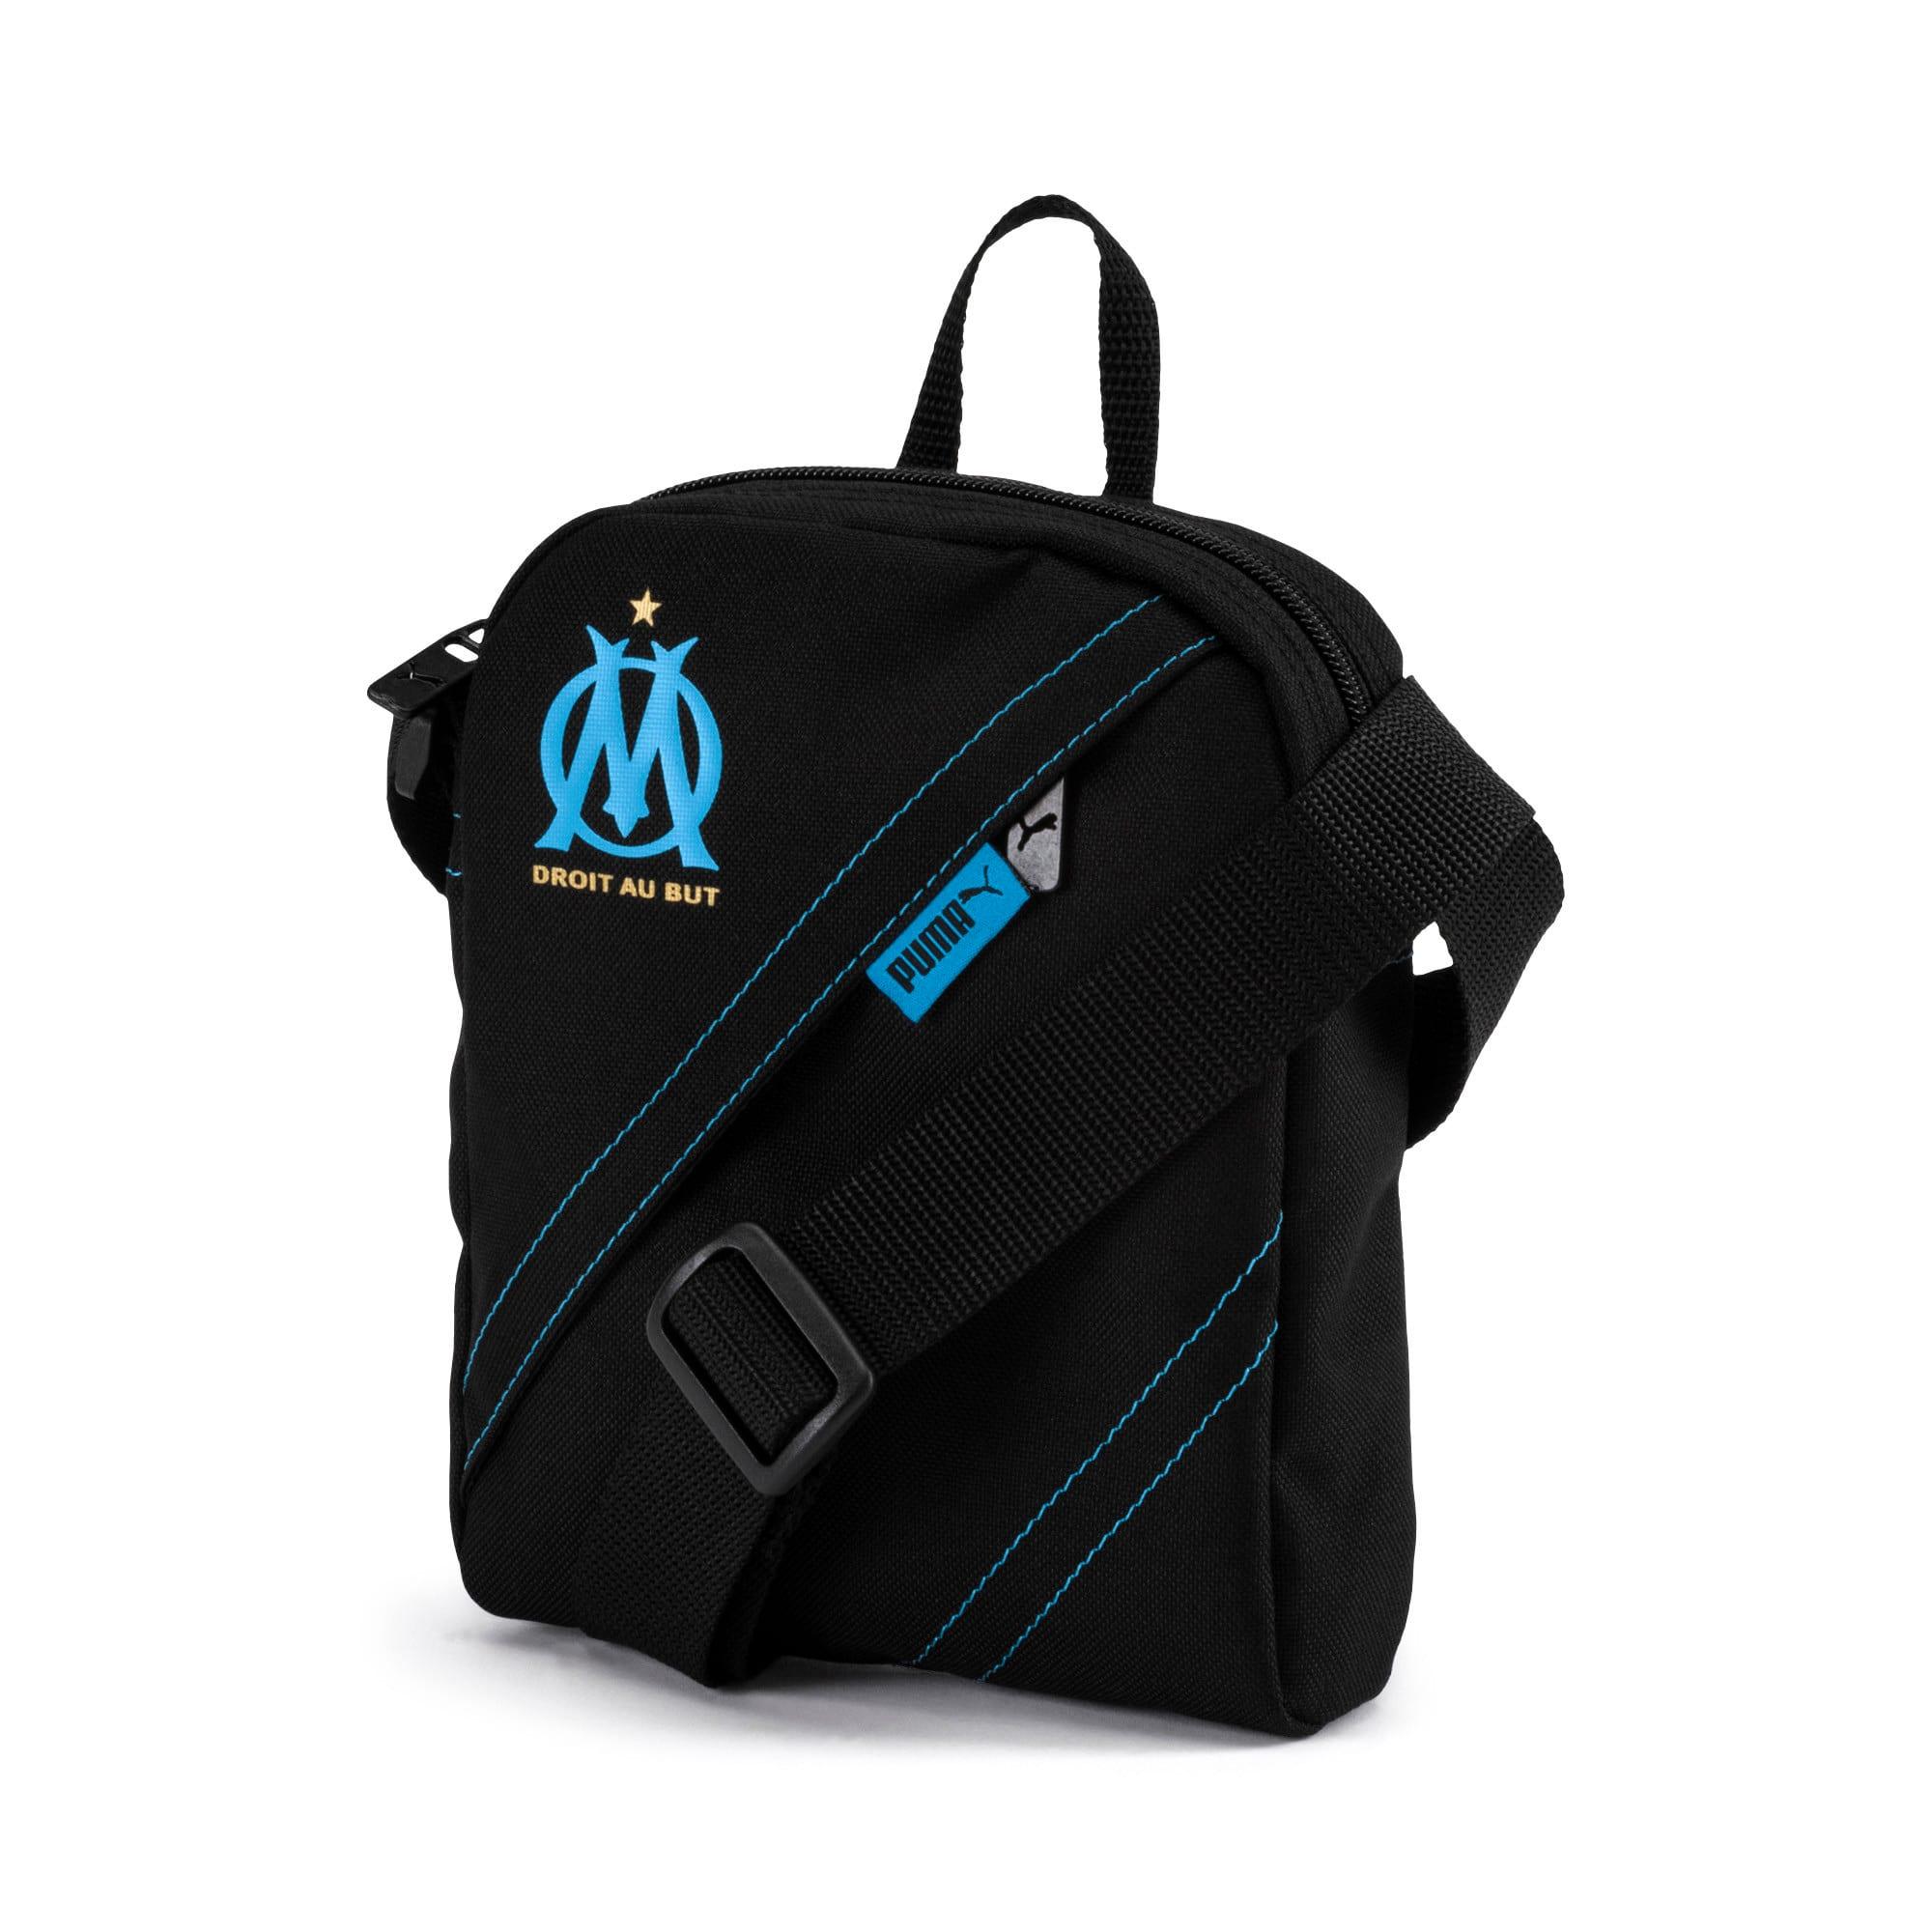 Thumbnail 1 of Olympique de Marseille City Shoulder Bag, Puma Black-AZURE BLUE, medium-IND